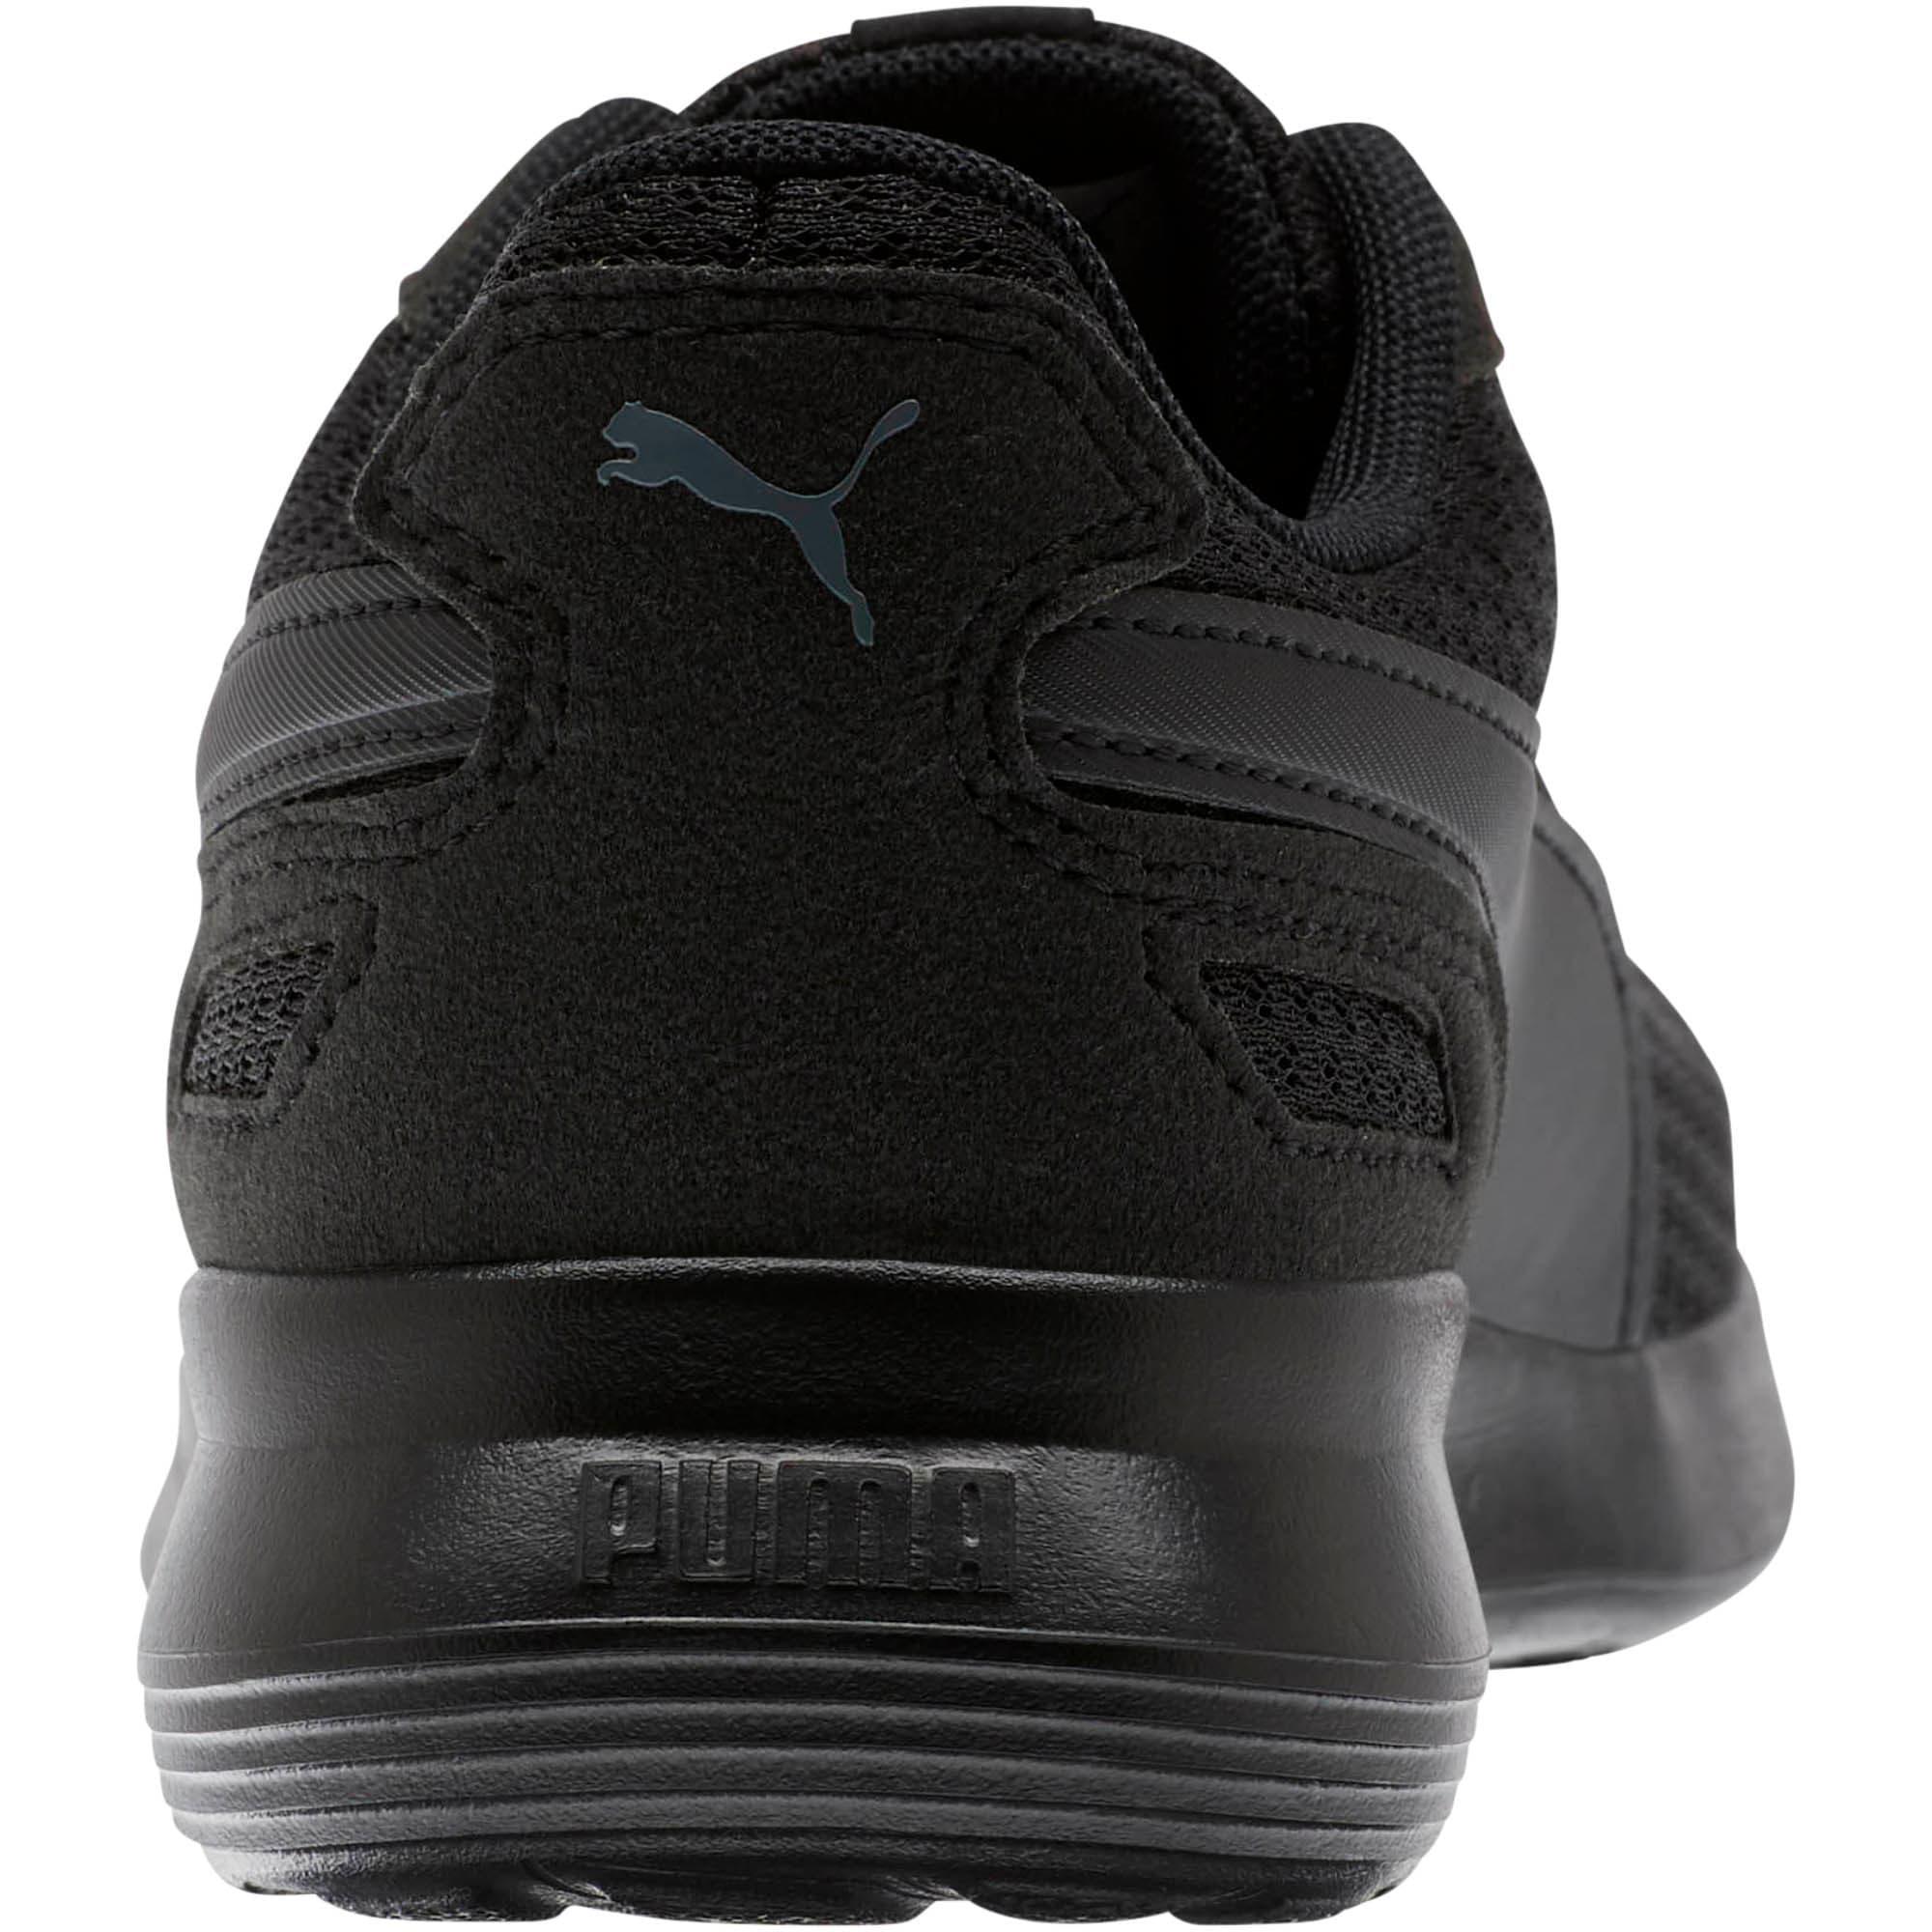 Thumbnail 3 of ST Activate Women's Sneakers, Puma Black-Puma Black, medium